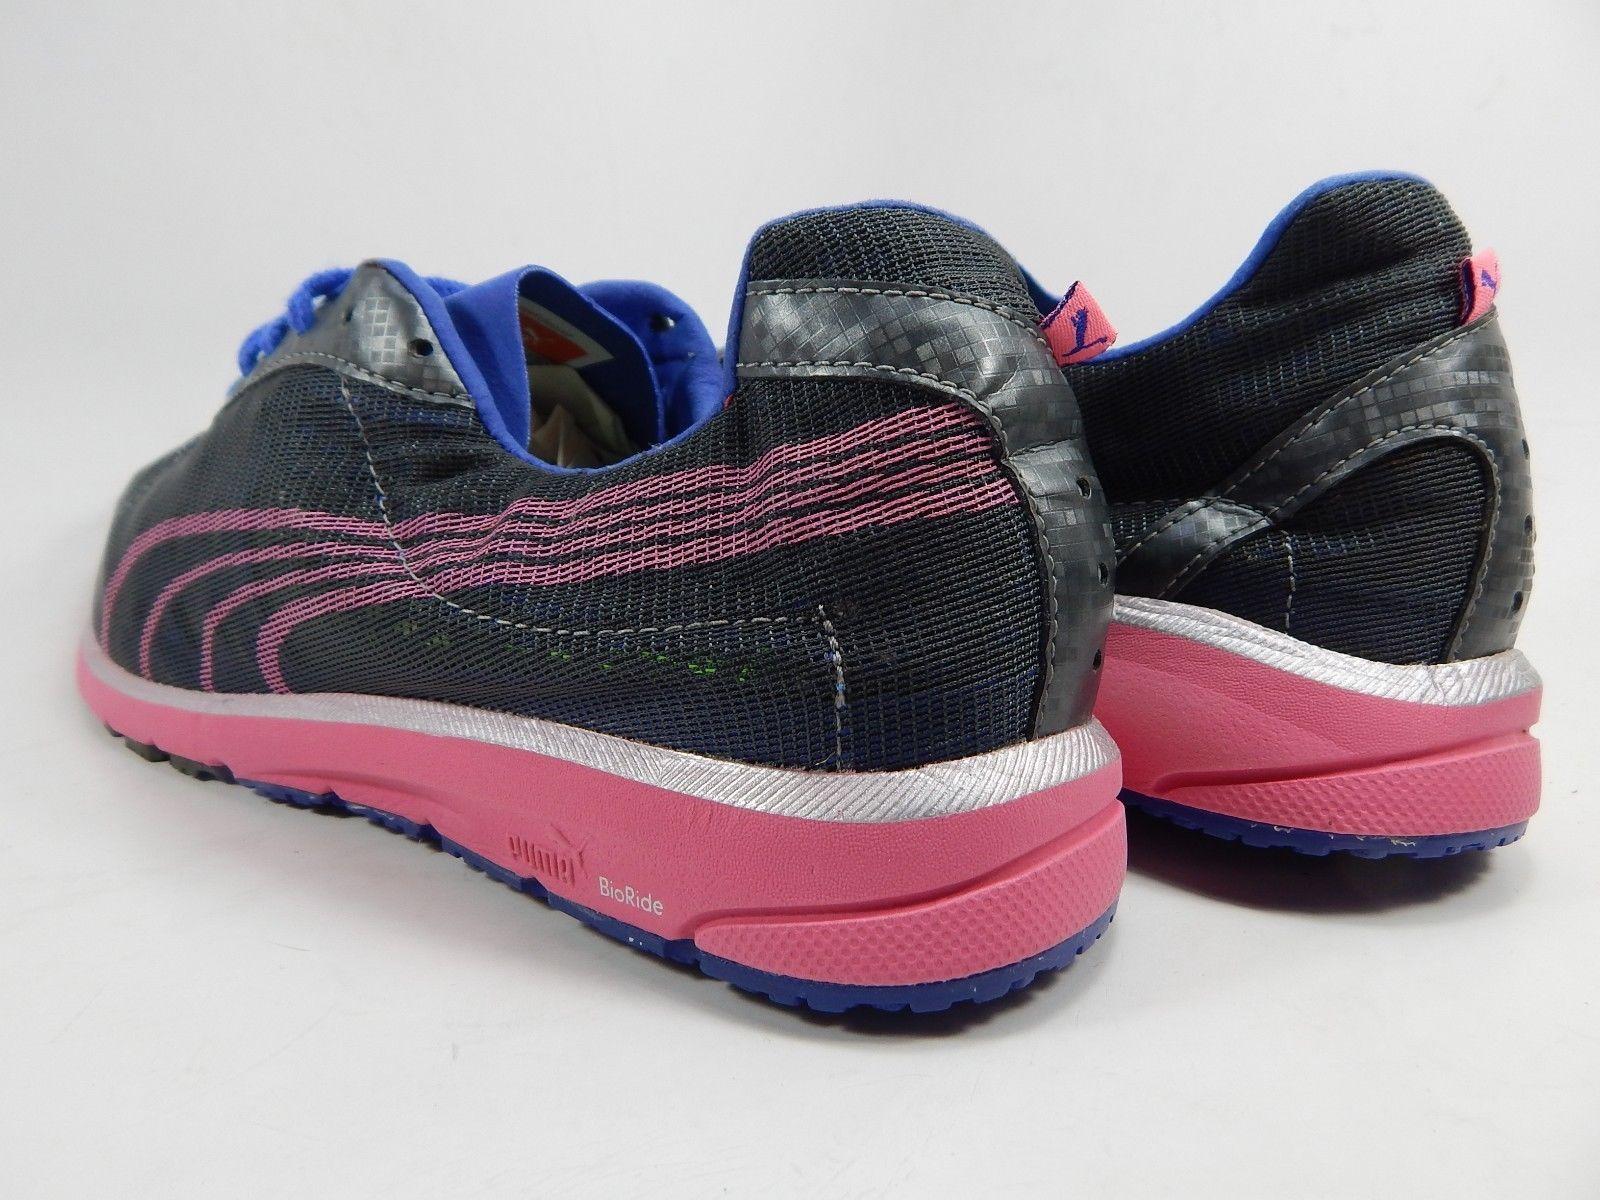 Puma Faas 250 Women's Running Shoes Size US 10.5 M (B) EU 42 Gray / Blue / Pink